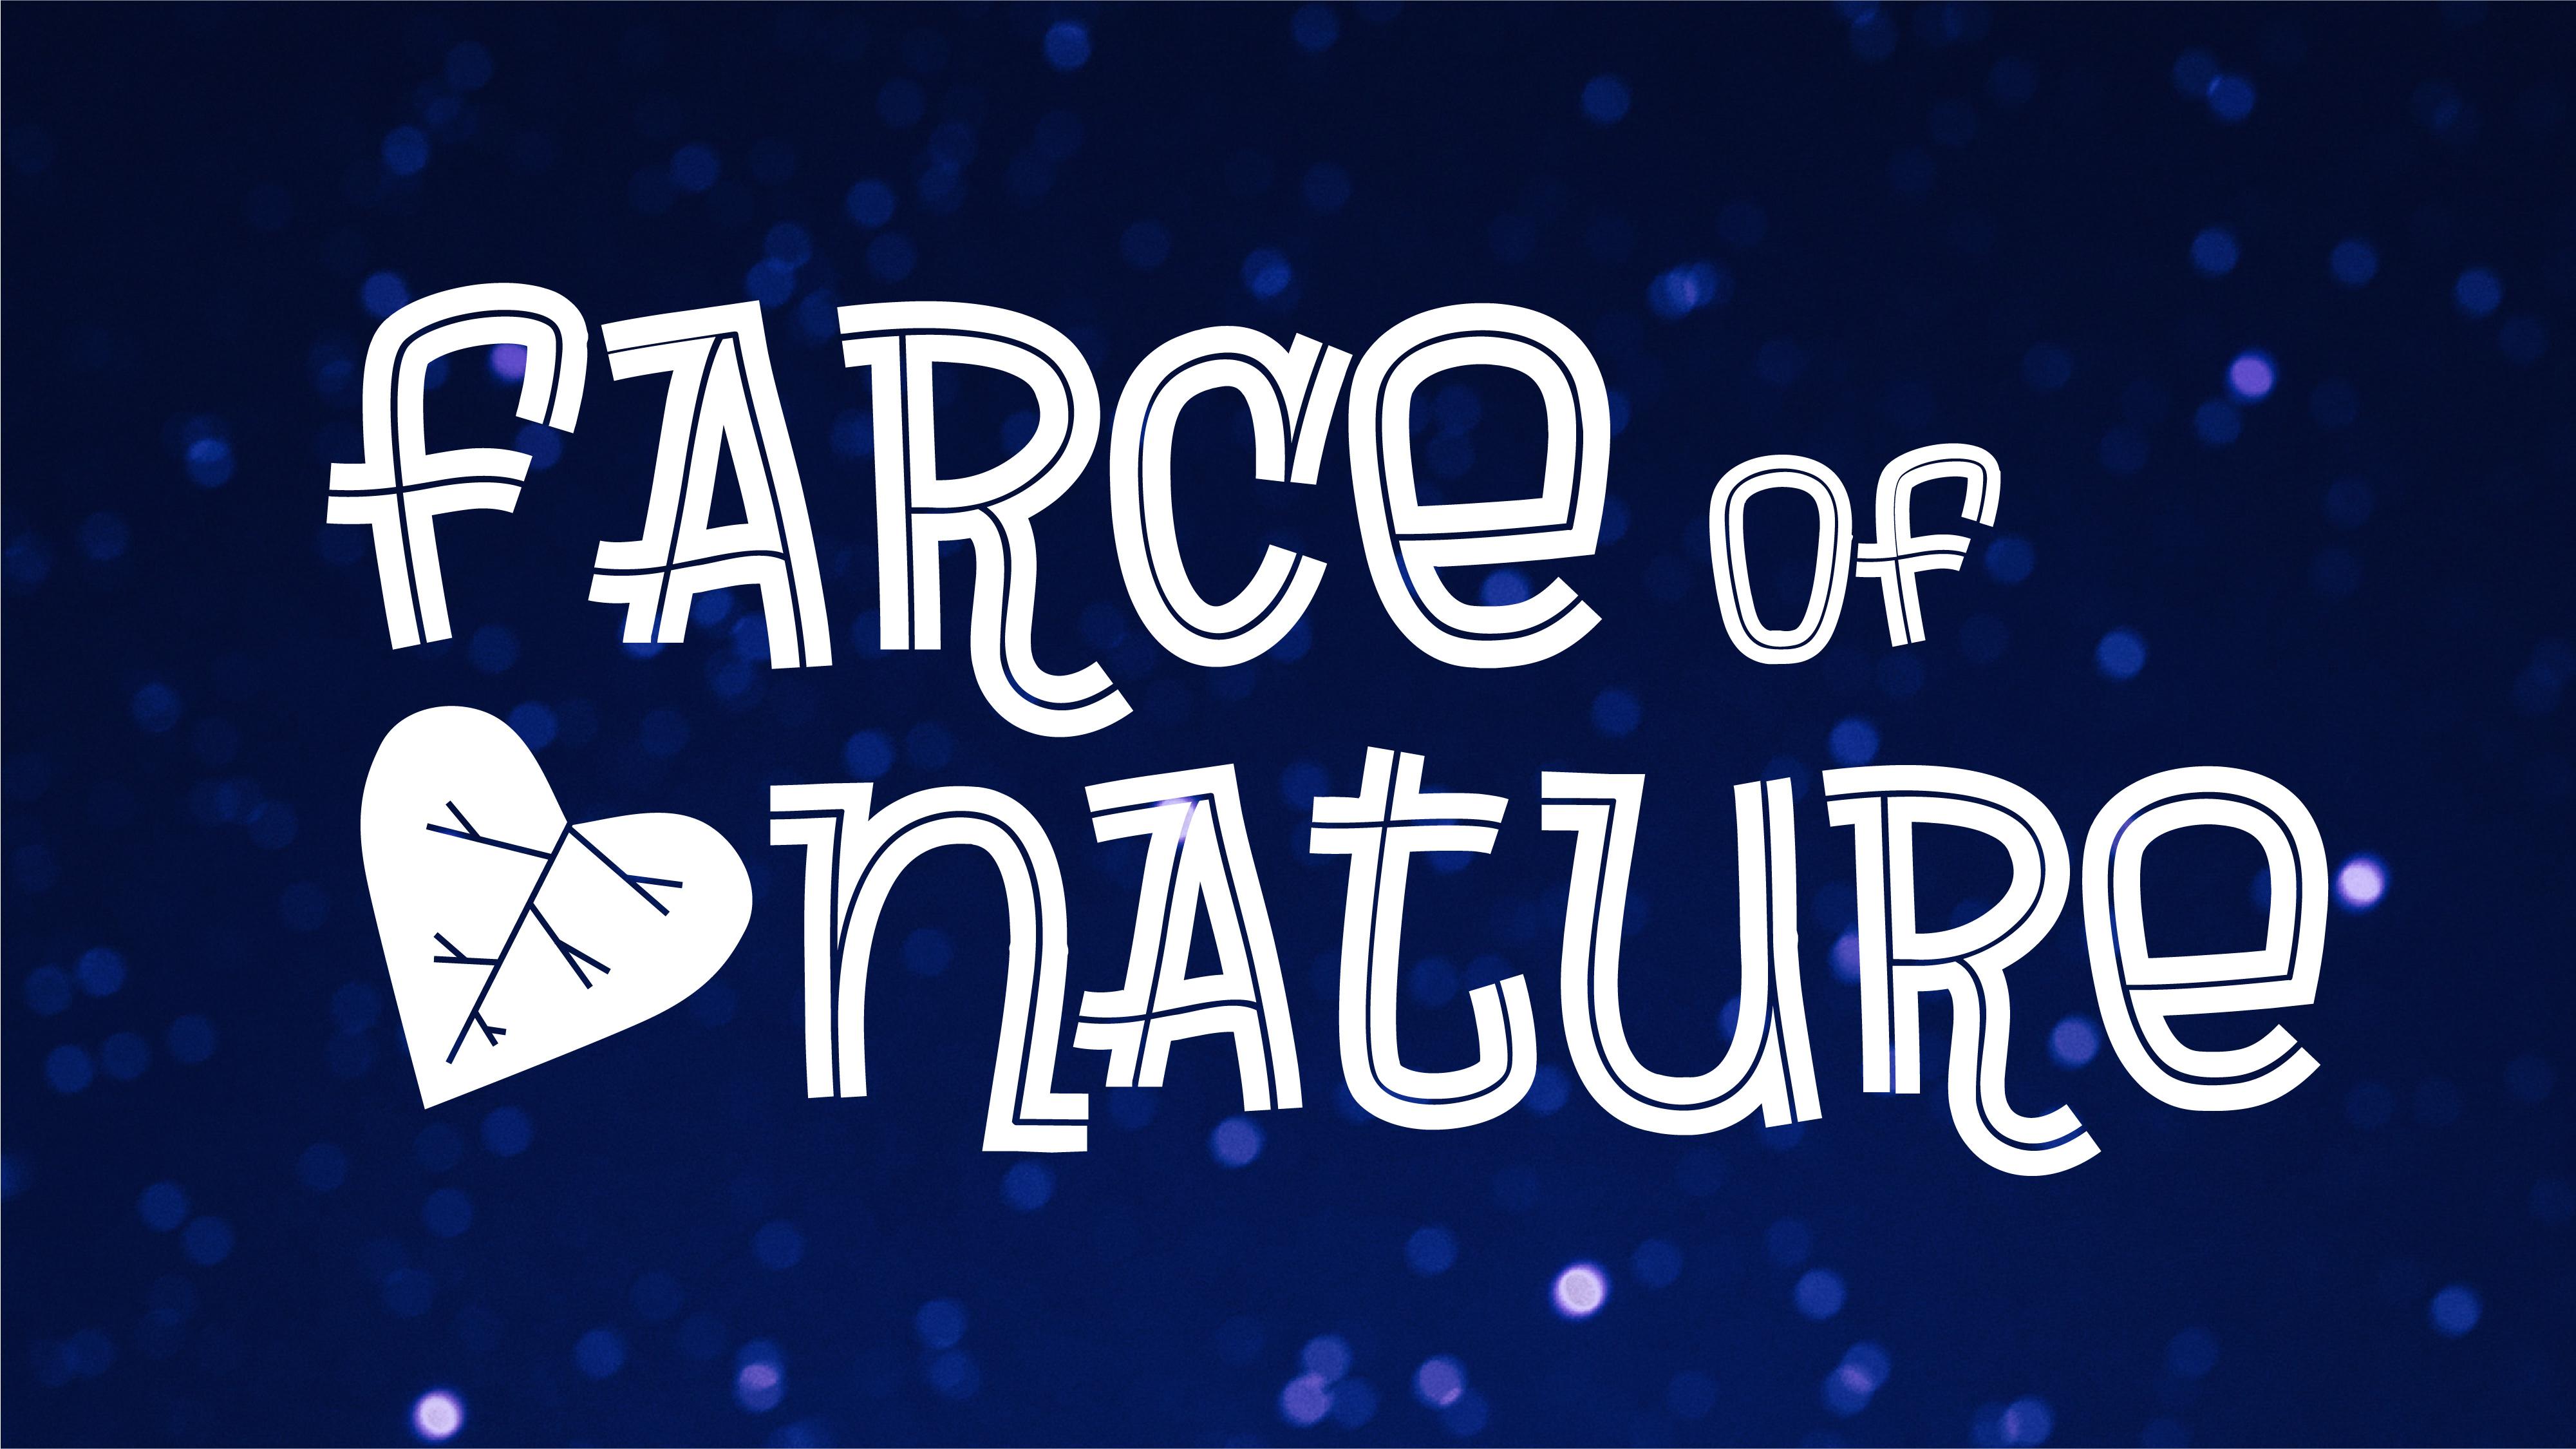 Farce of Nature